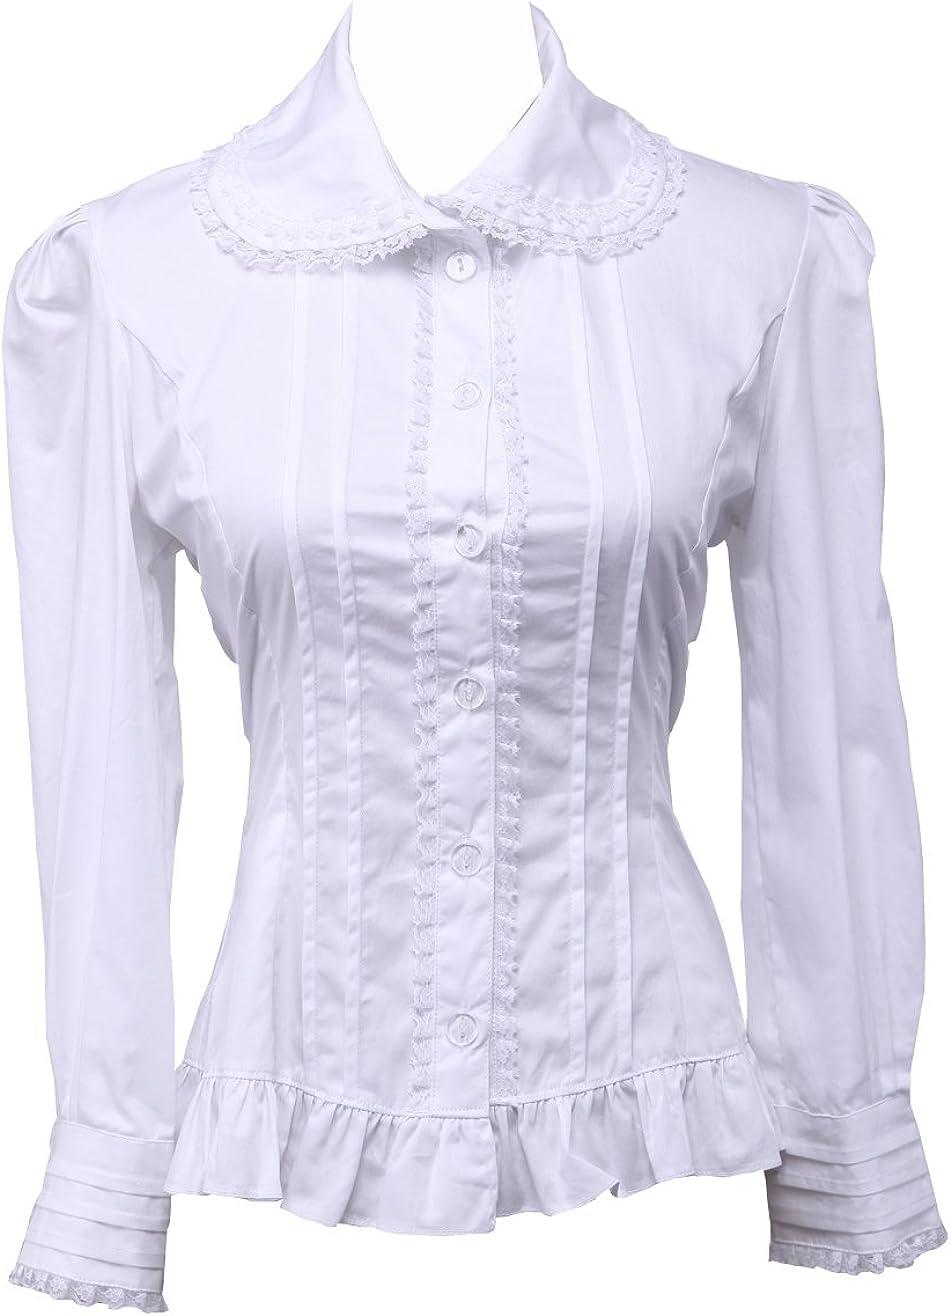 Women/'s ML Top Vintage Cotton Ruffle Top